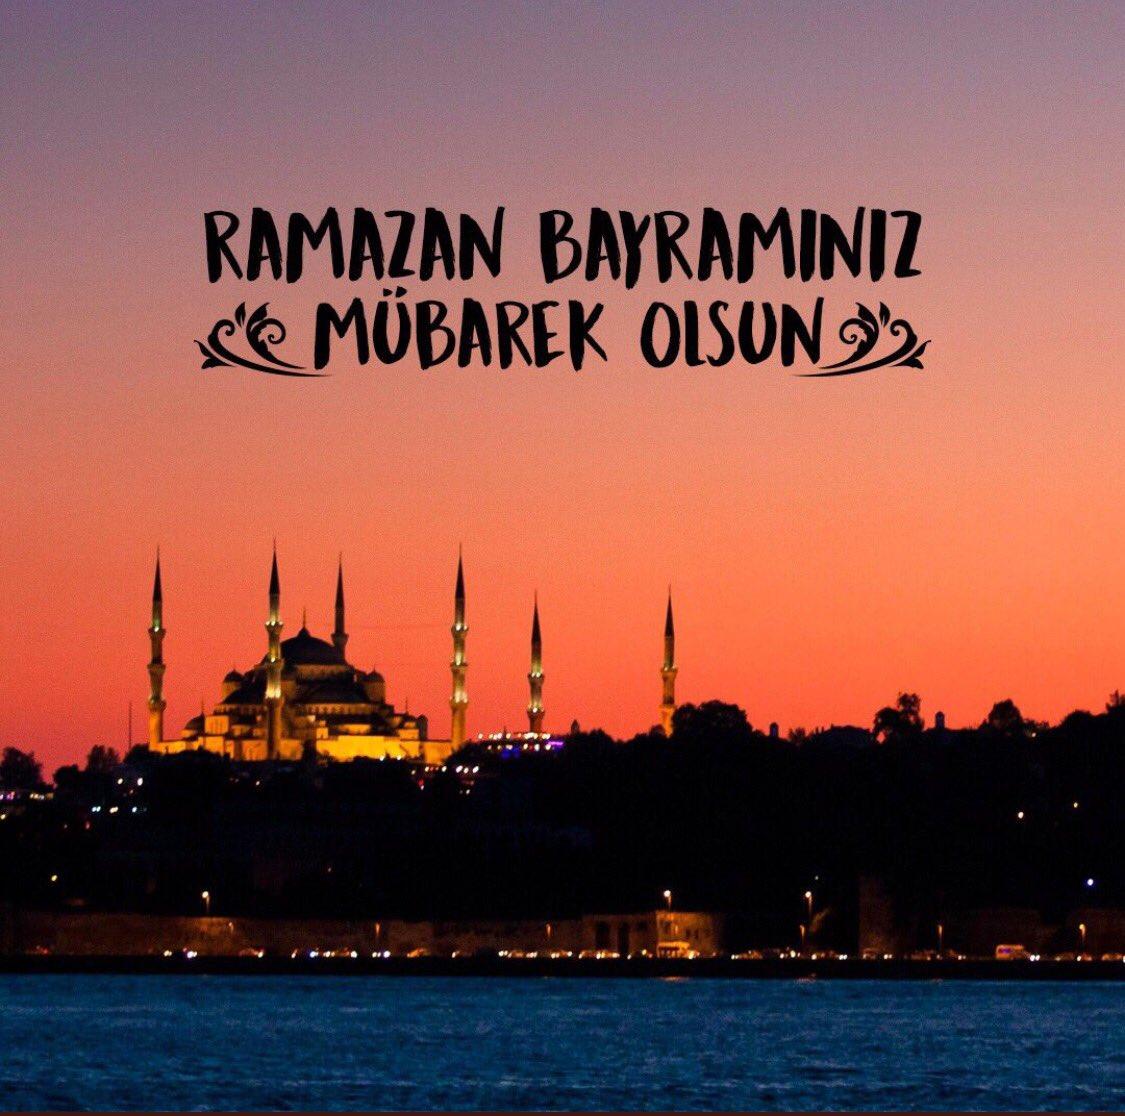 Открытка охотнику, открытки рамадан на турецком